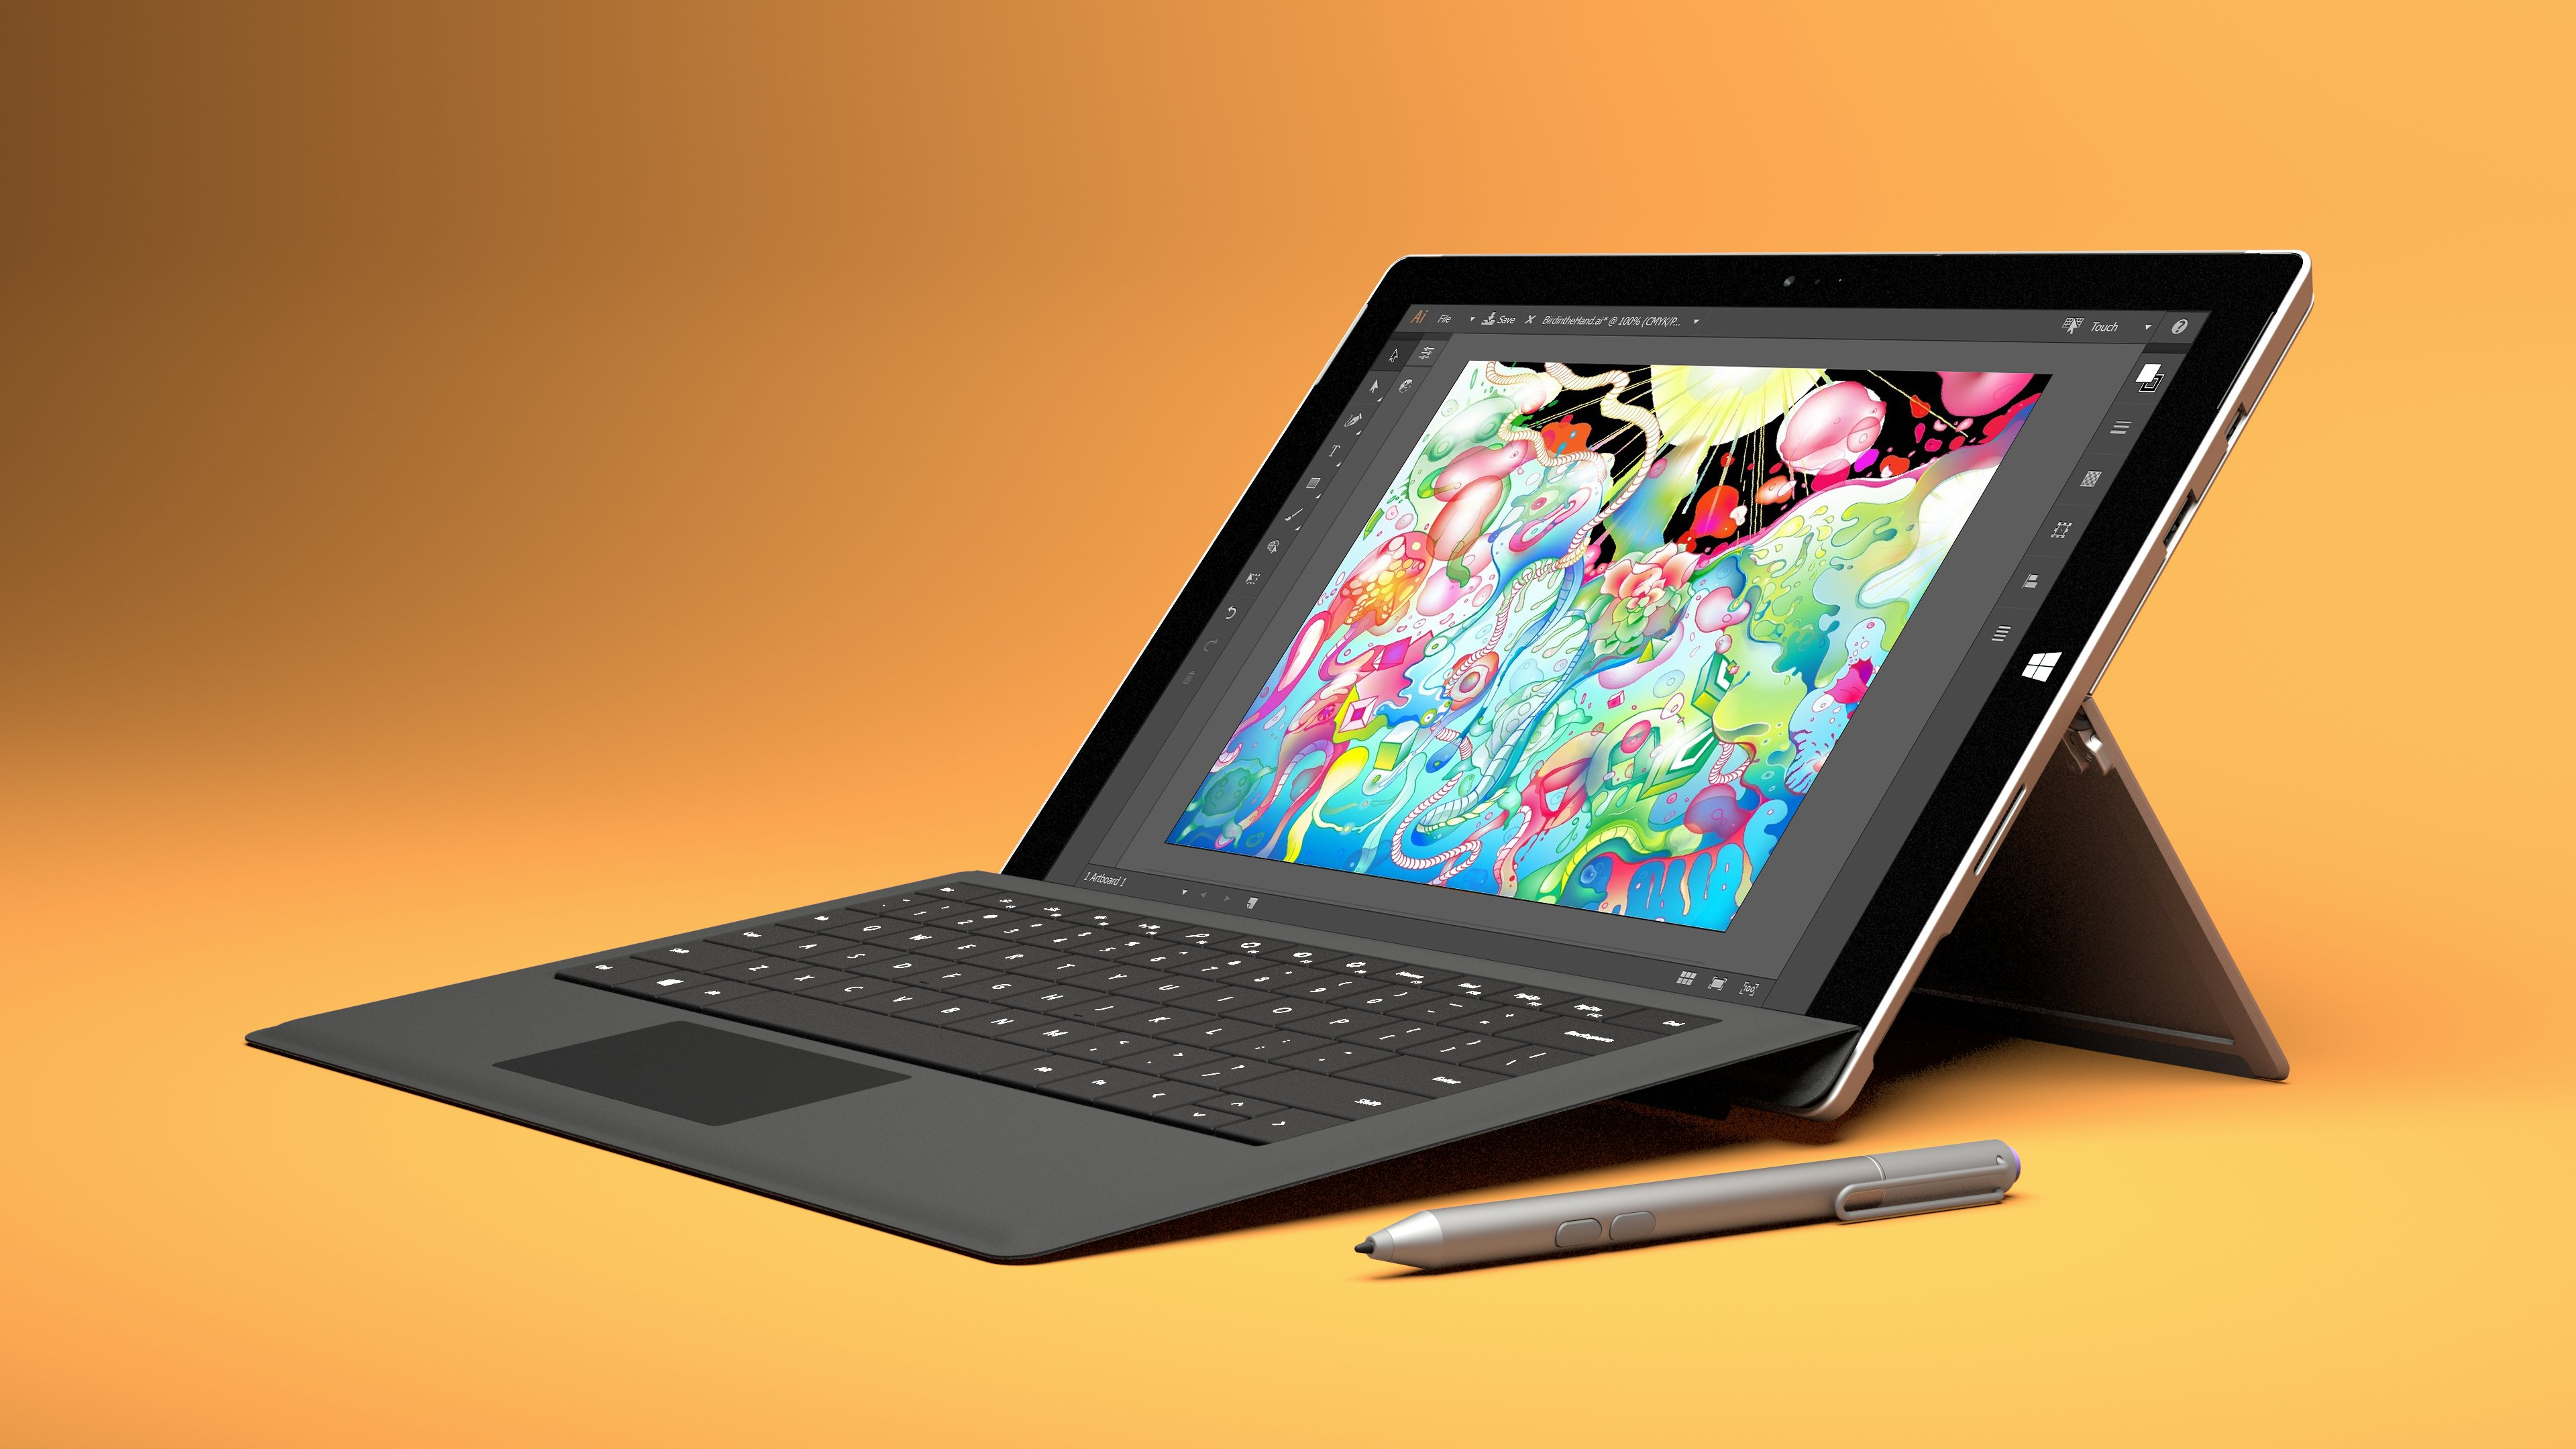 Microsoft Surface Pro 4 – lightweight laptops